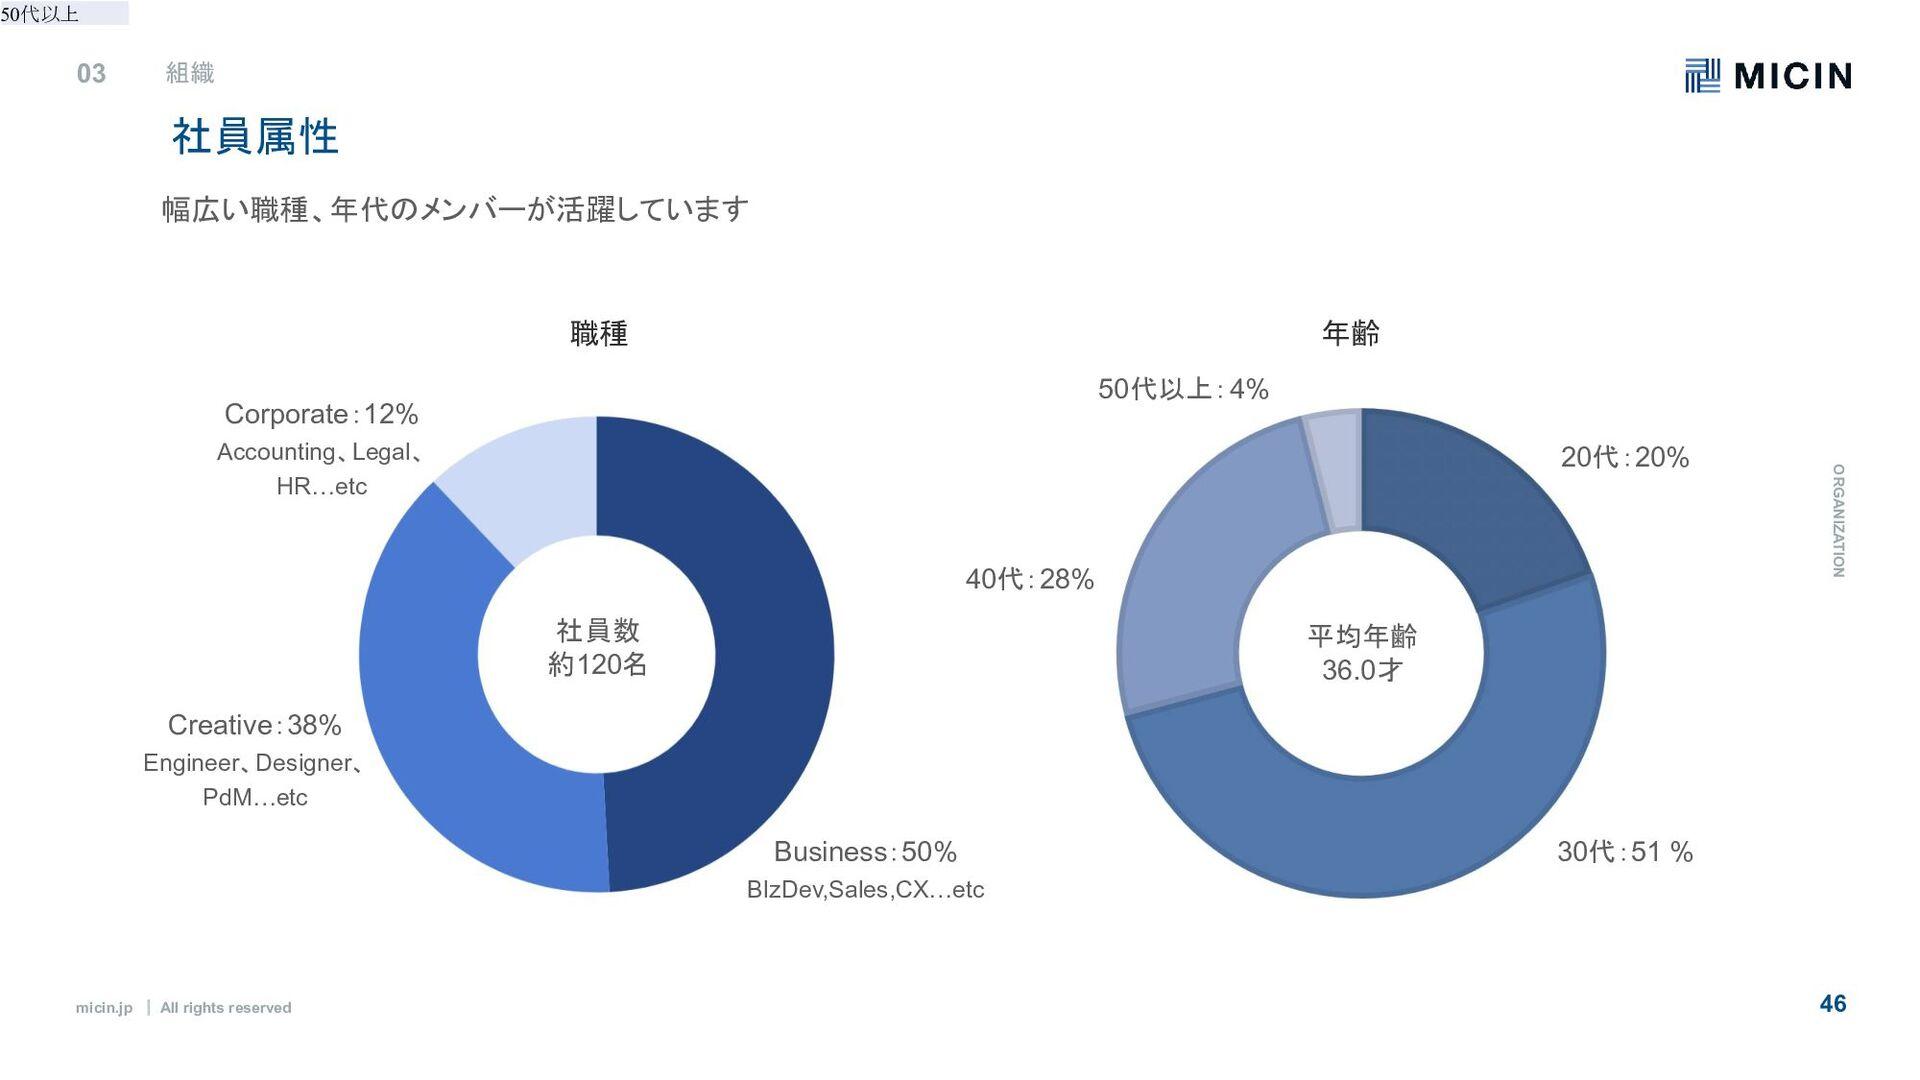 micin.jp ʛ All rights reserved 46 メンバー紹介 03 O R...